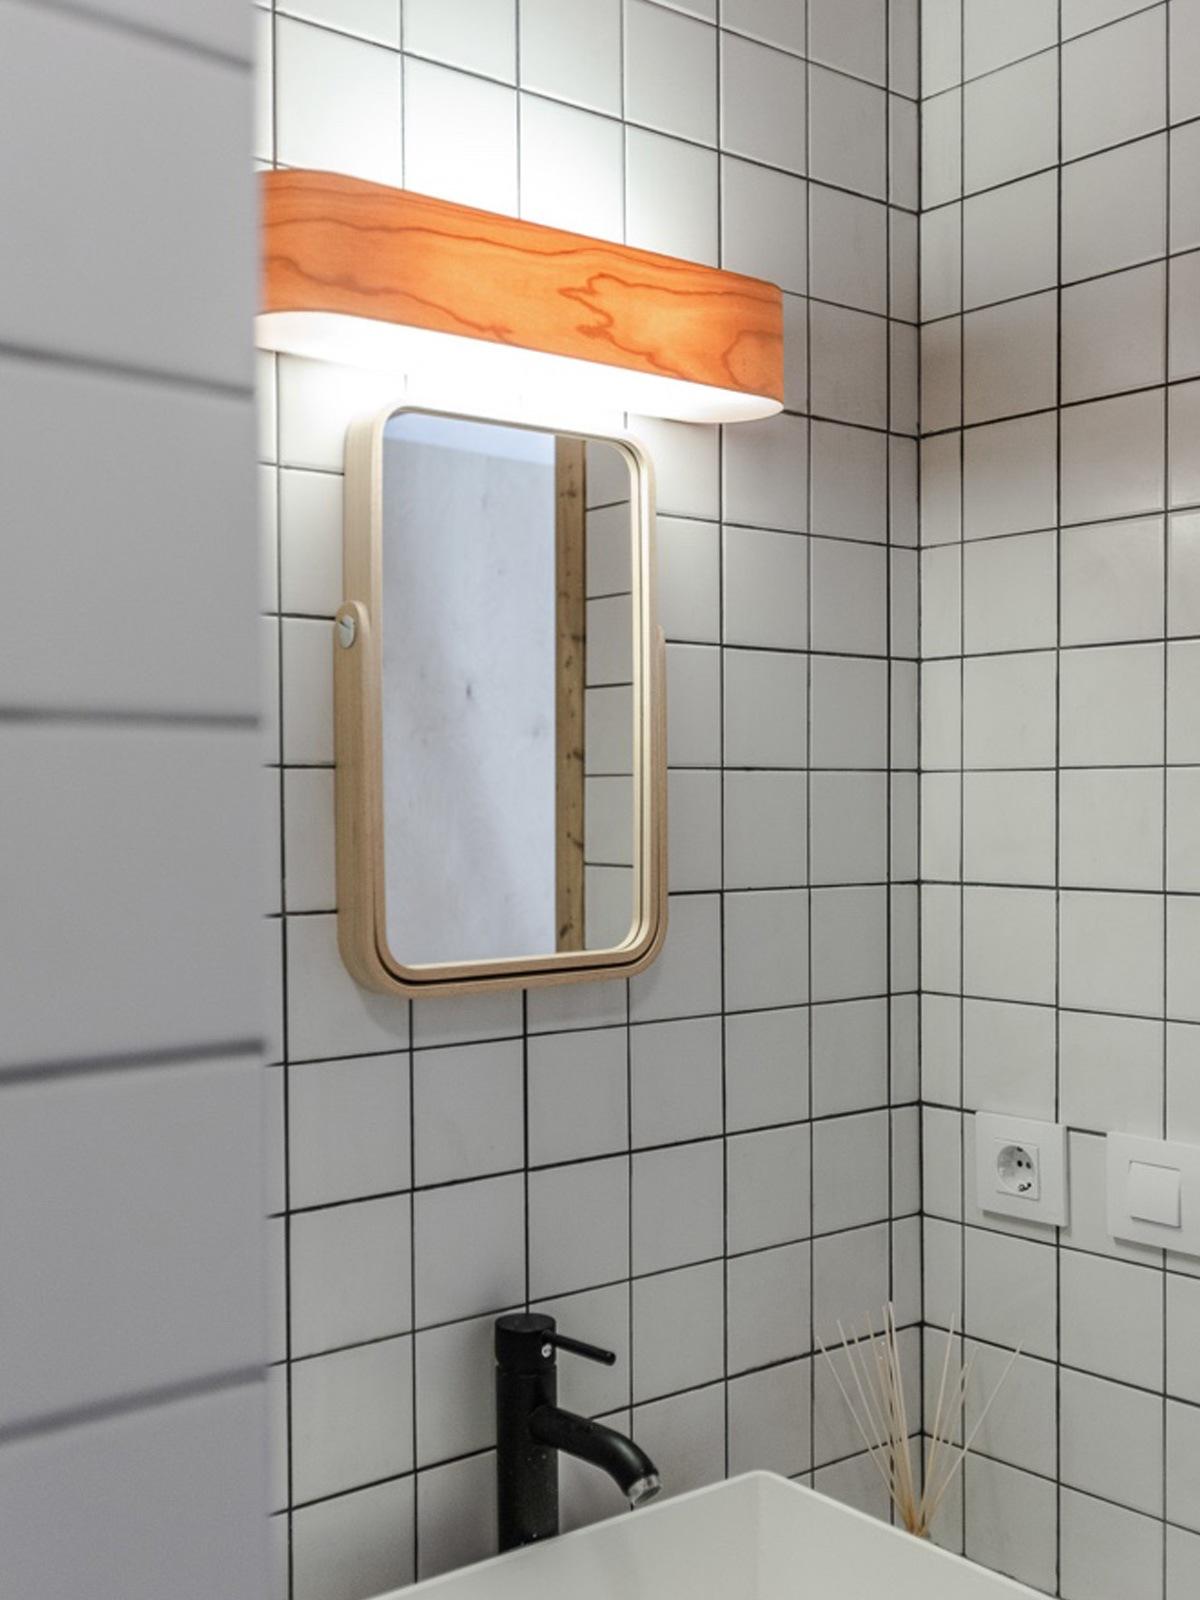 I-Club A Wandleuchte LZF DesignOrt Lampen Berlin